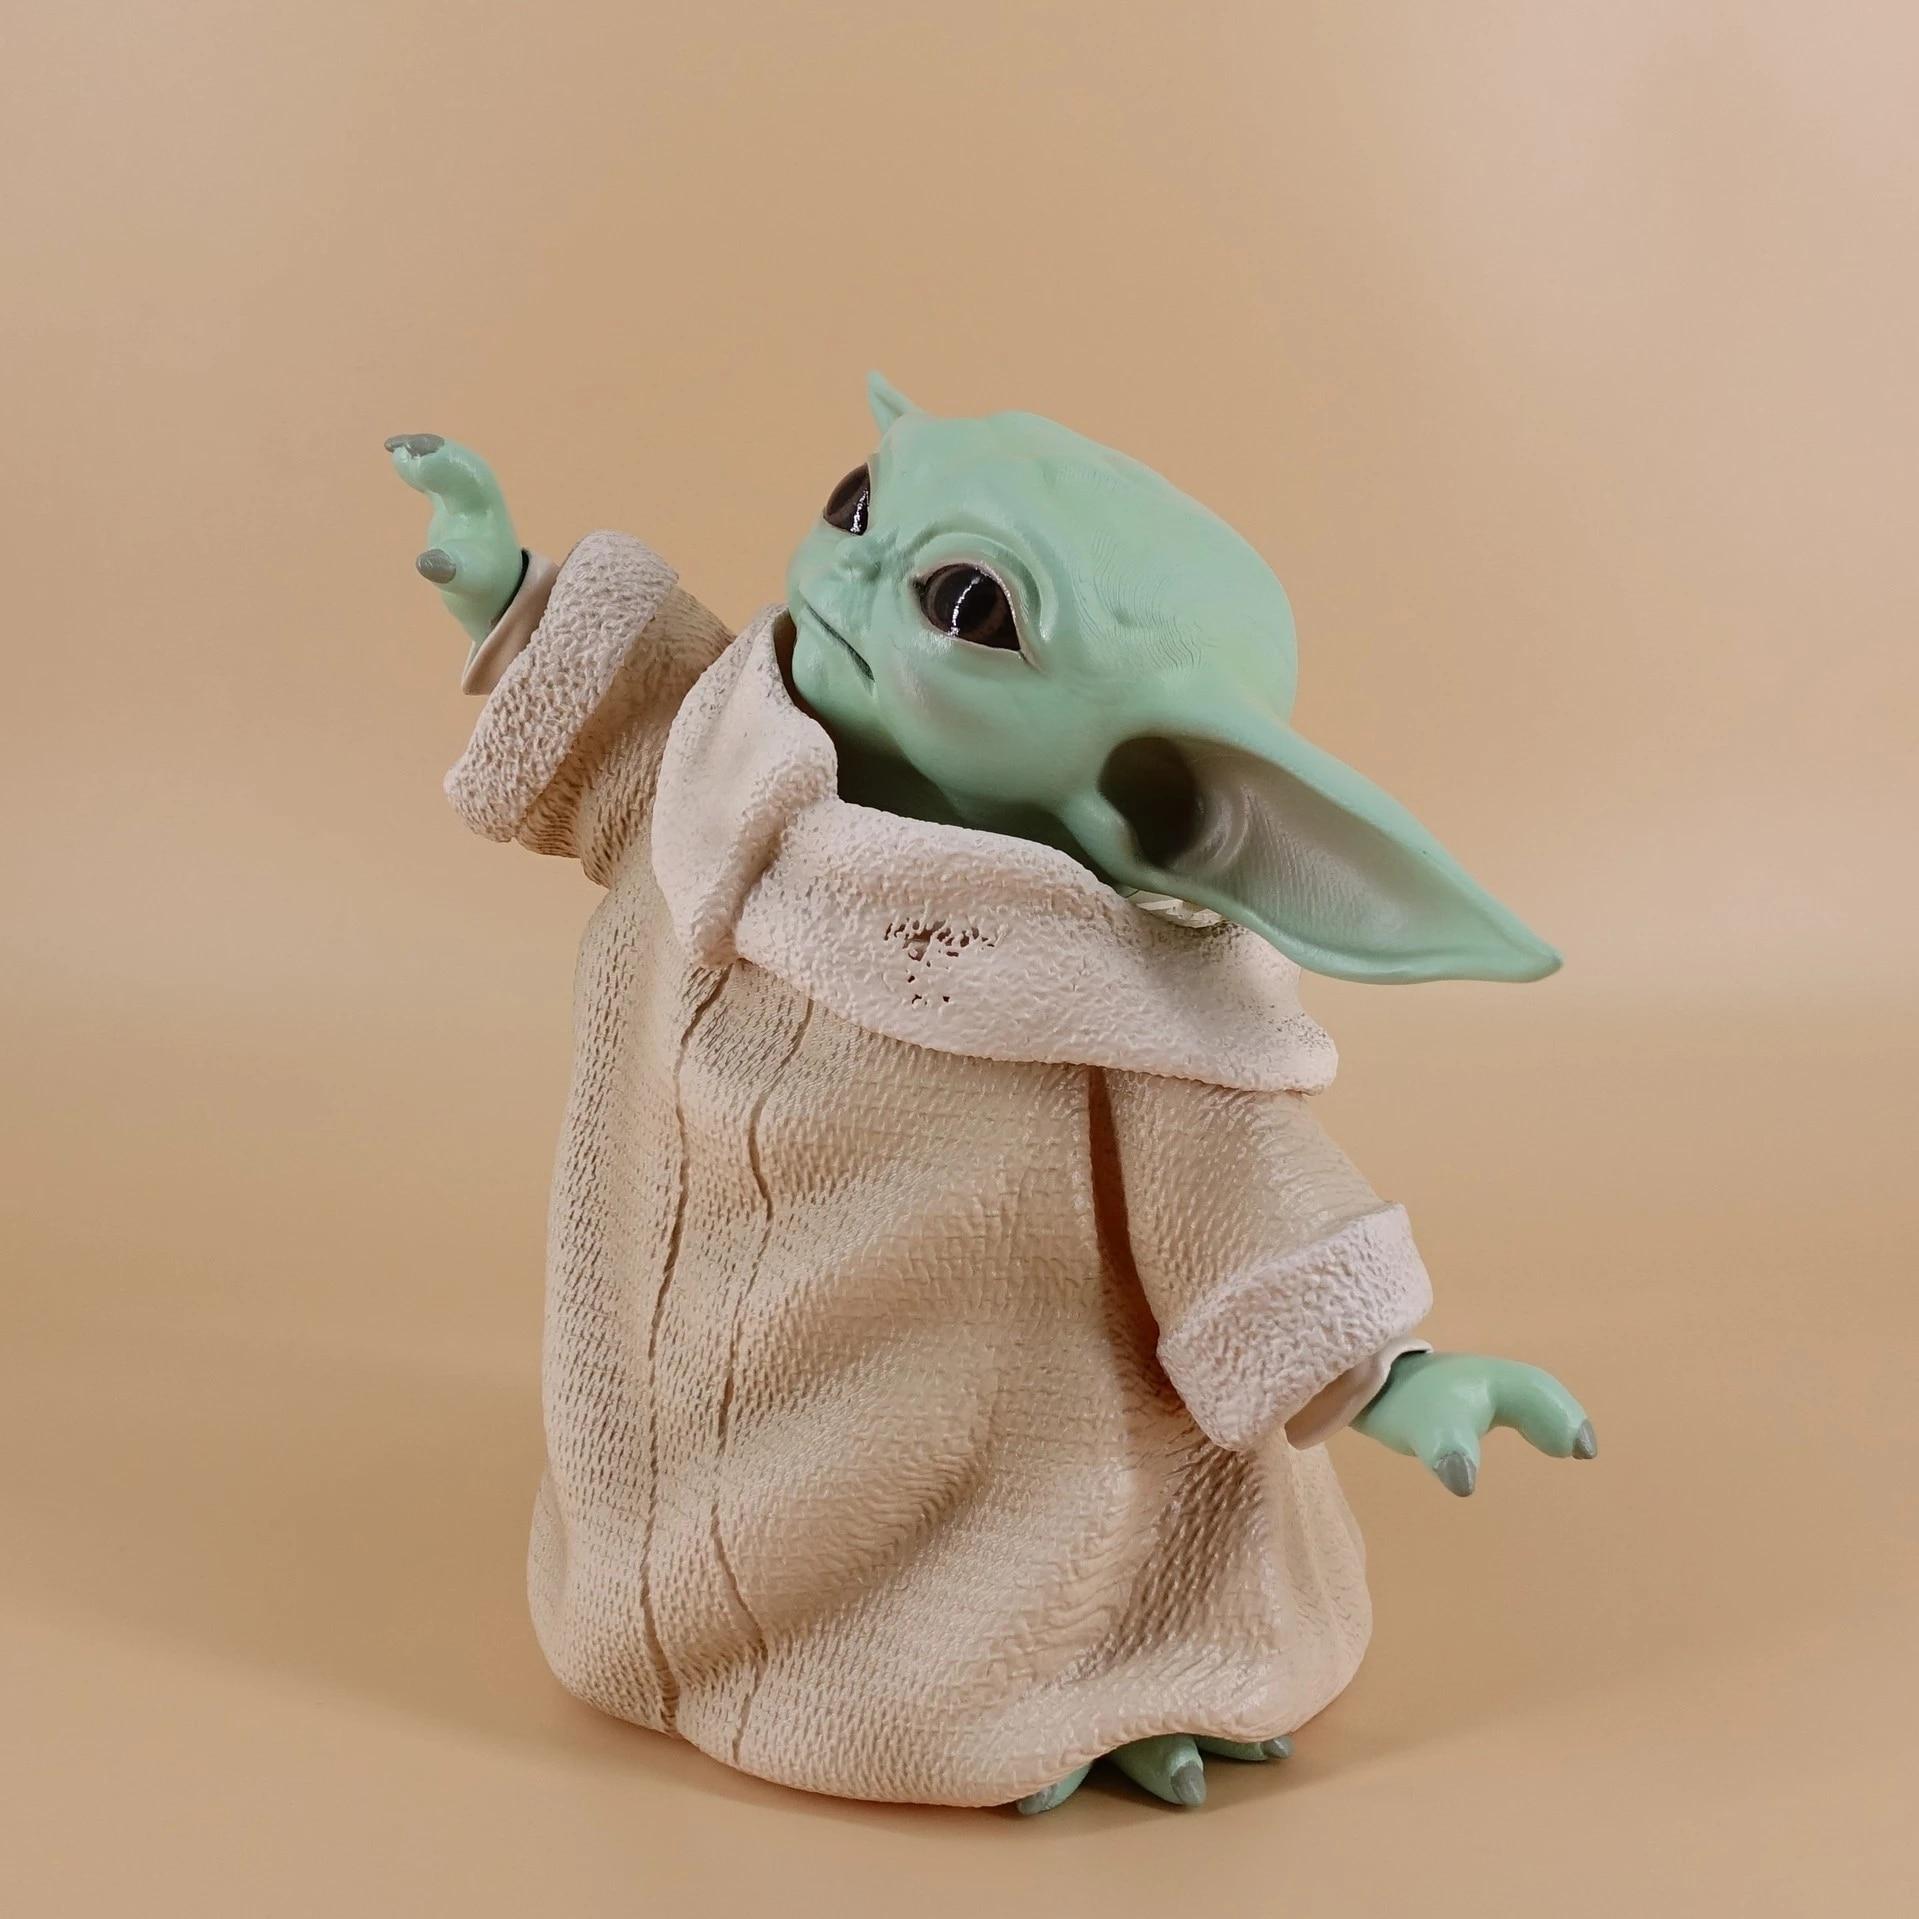 Star Wars baby yoda Static stance wave Mandalorian baby yoda Toy Figures Model